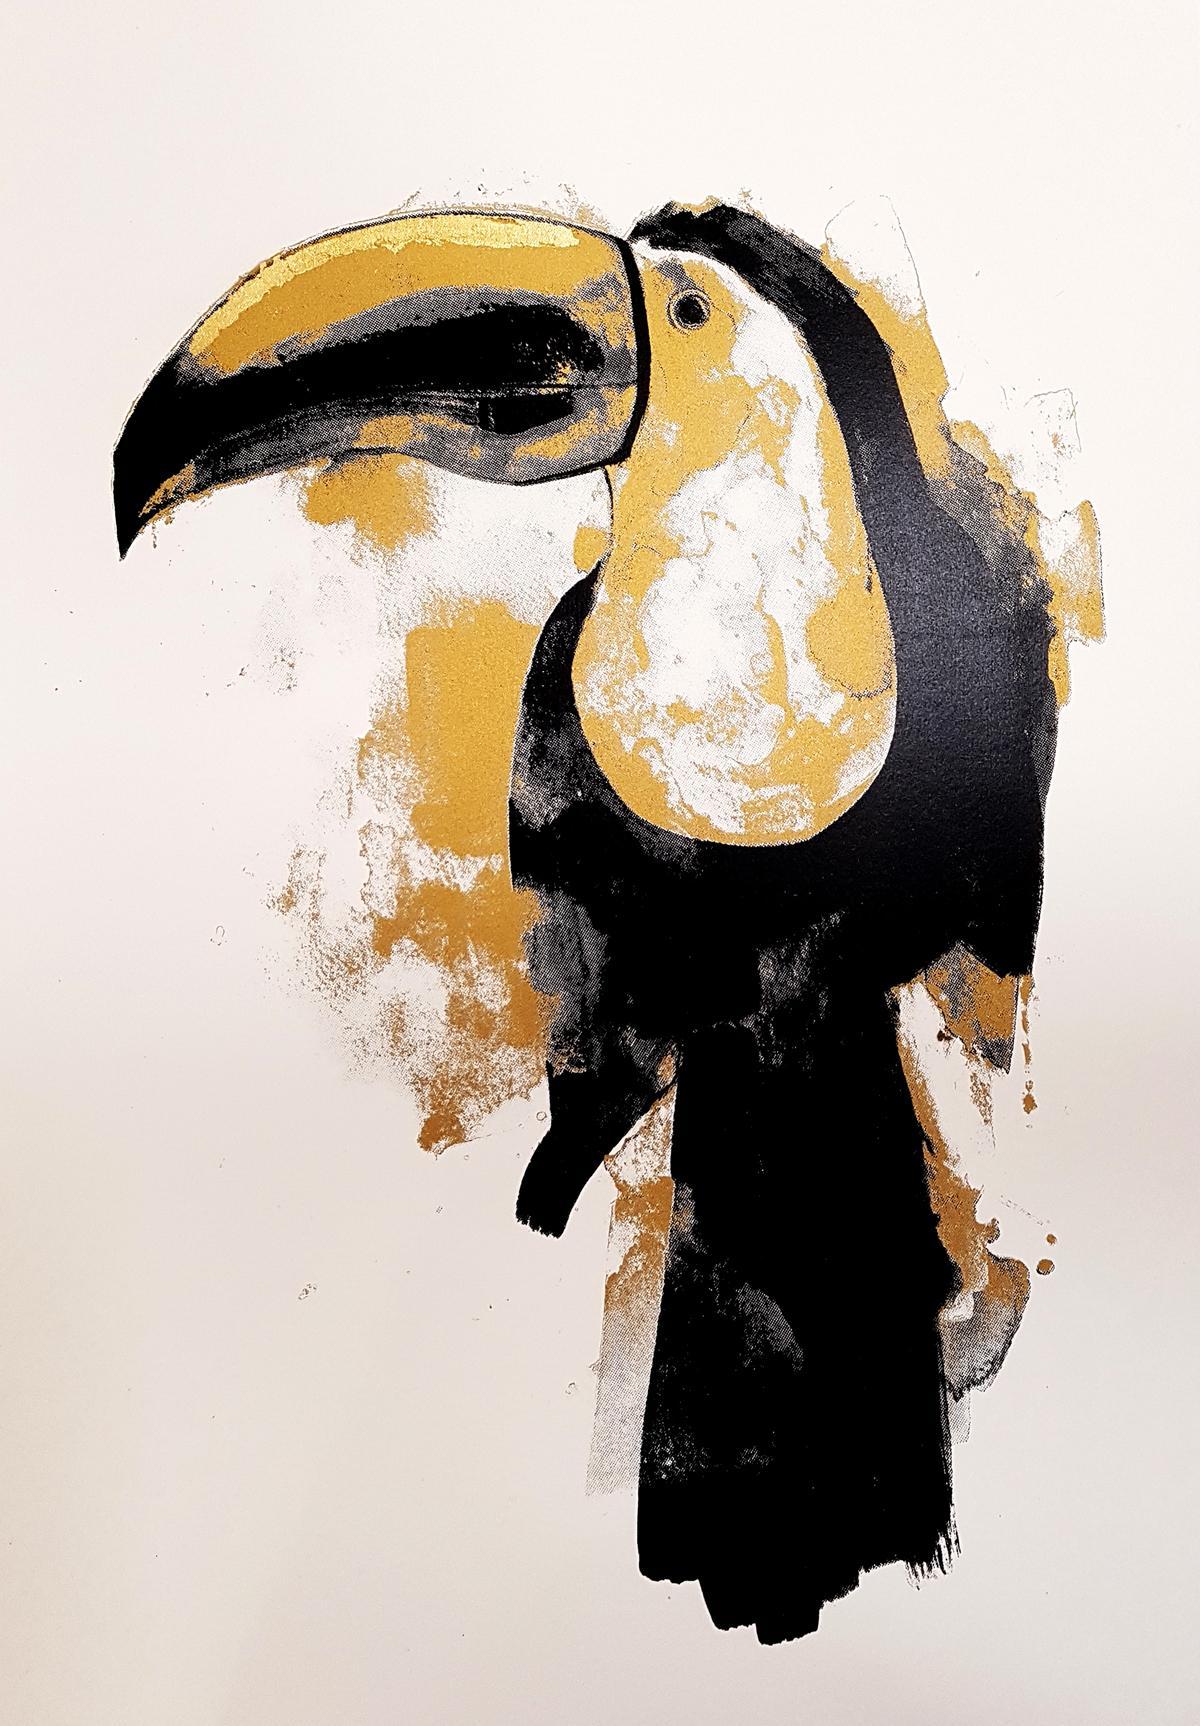 Gavin Dobson, Toucan Gold, Limited Edition Silkscreen Print, Bird Art, AnimalArt